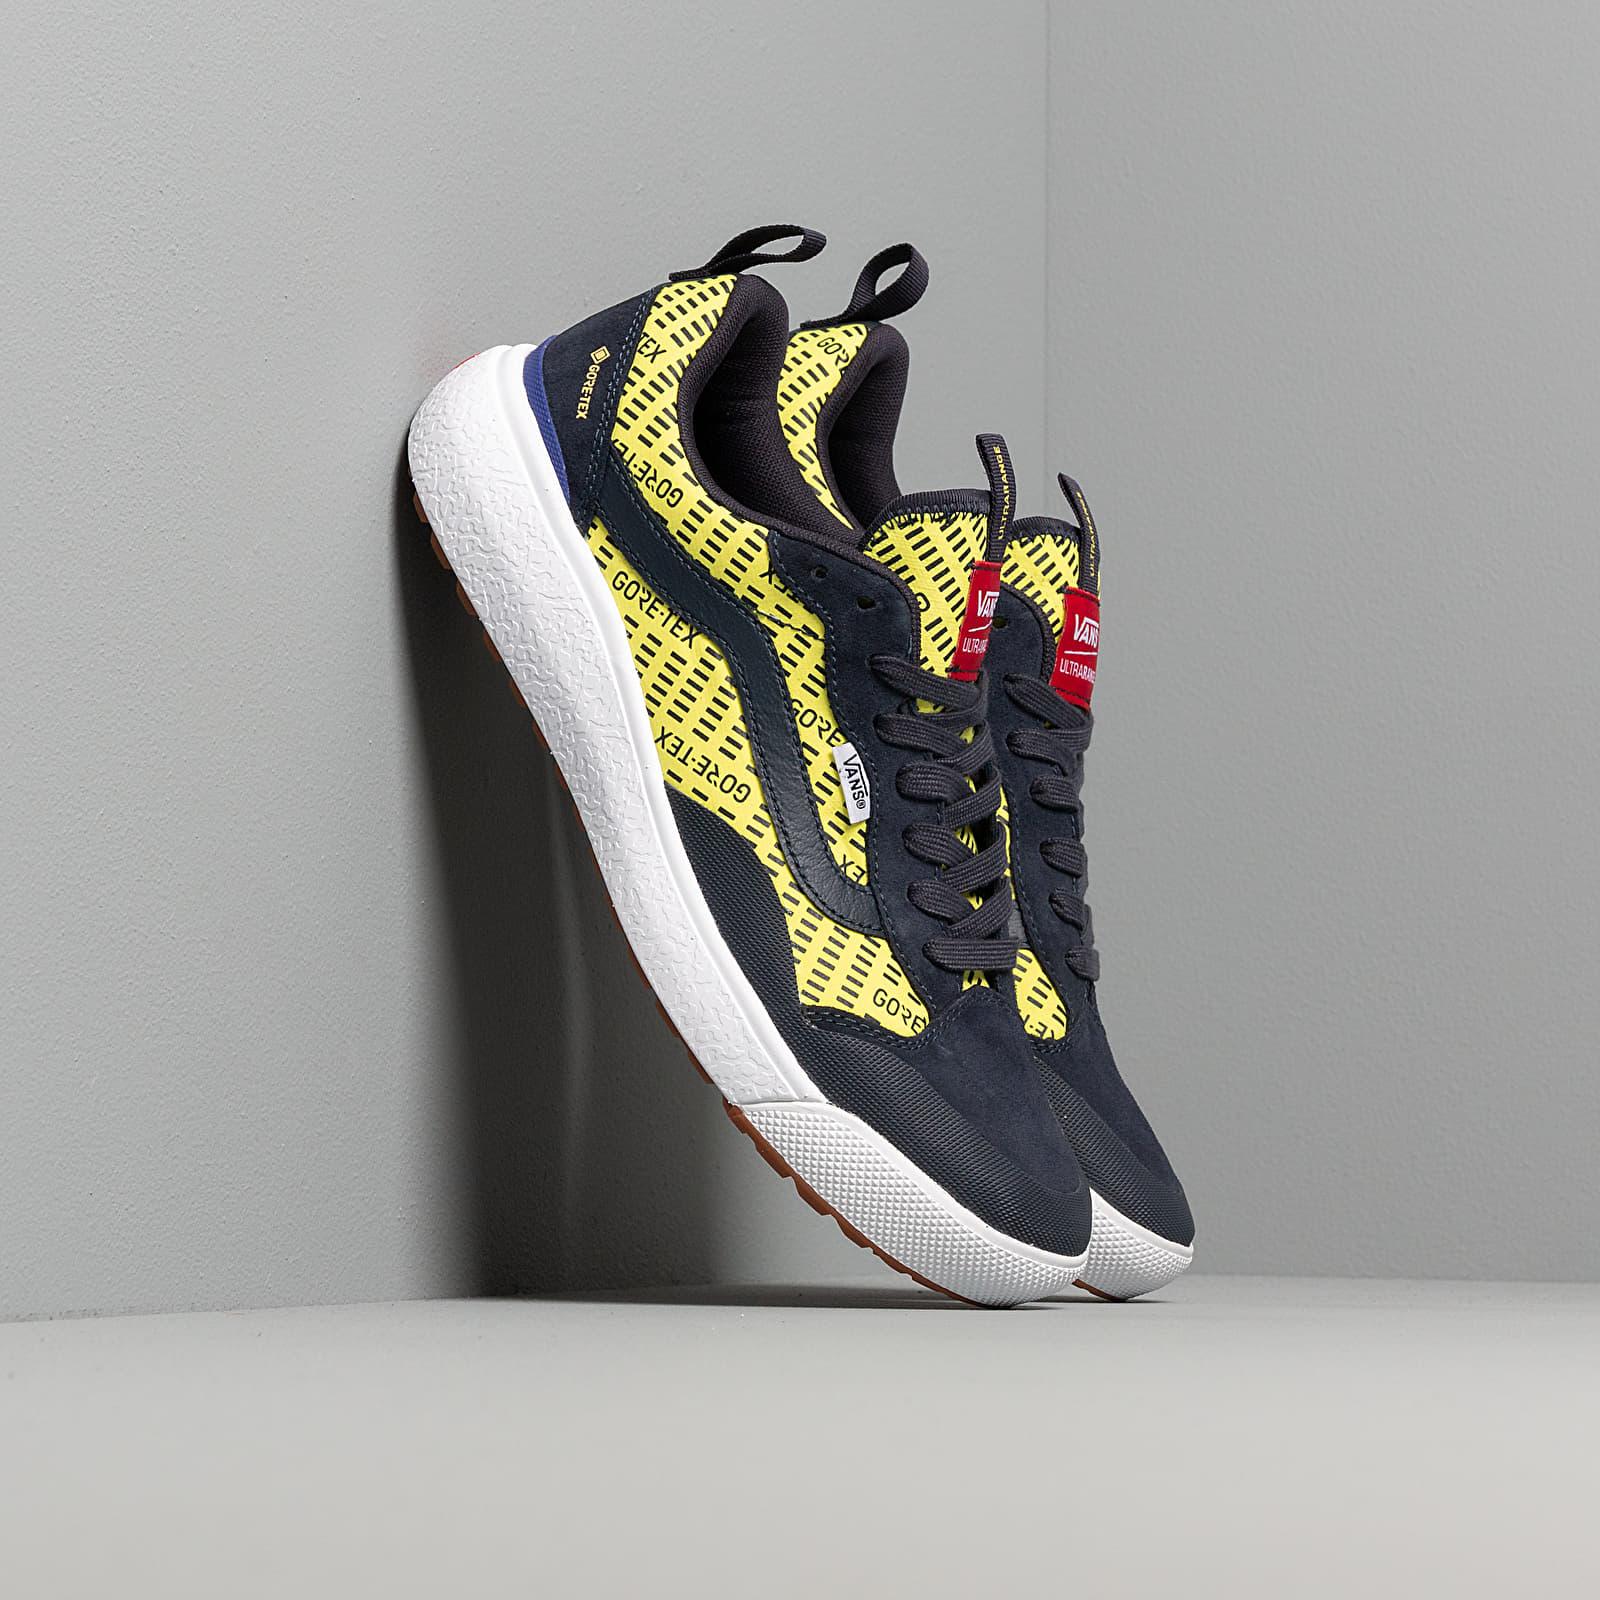 Chaussures et baskets homme Vans Ultrarange 2.0 Gore-Tex Navy/ Yellow